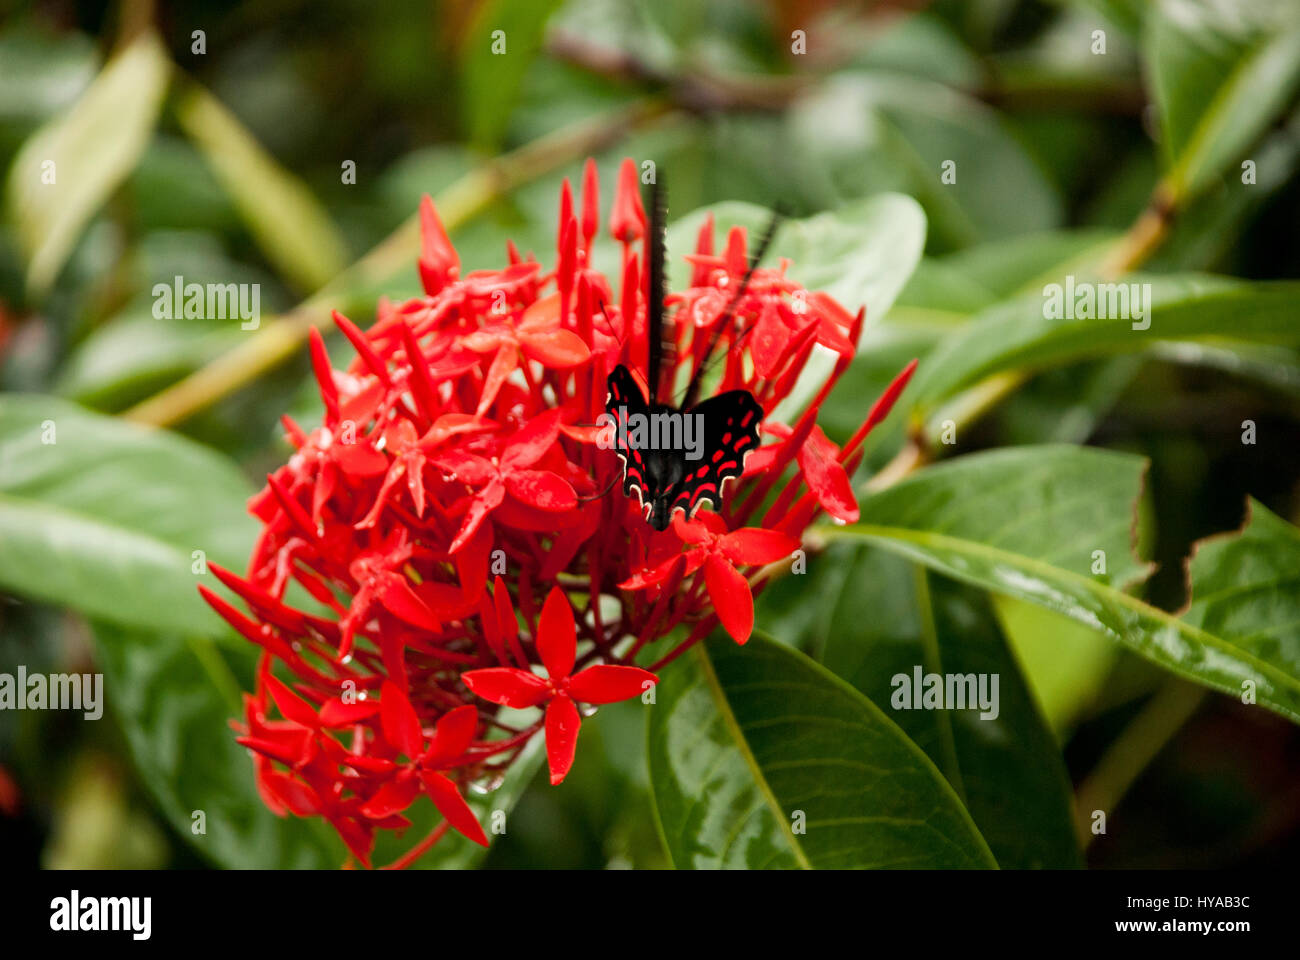 red ixora coccinea jungle geranium stockfotos red ixora coccinea jungle geranium bilder alamy. Black Bedroom Furniture Sets. Home Design Ideas